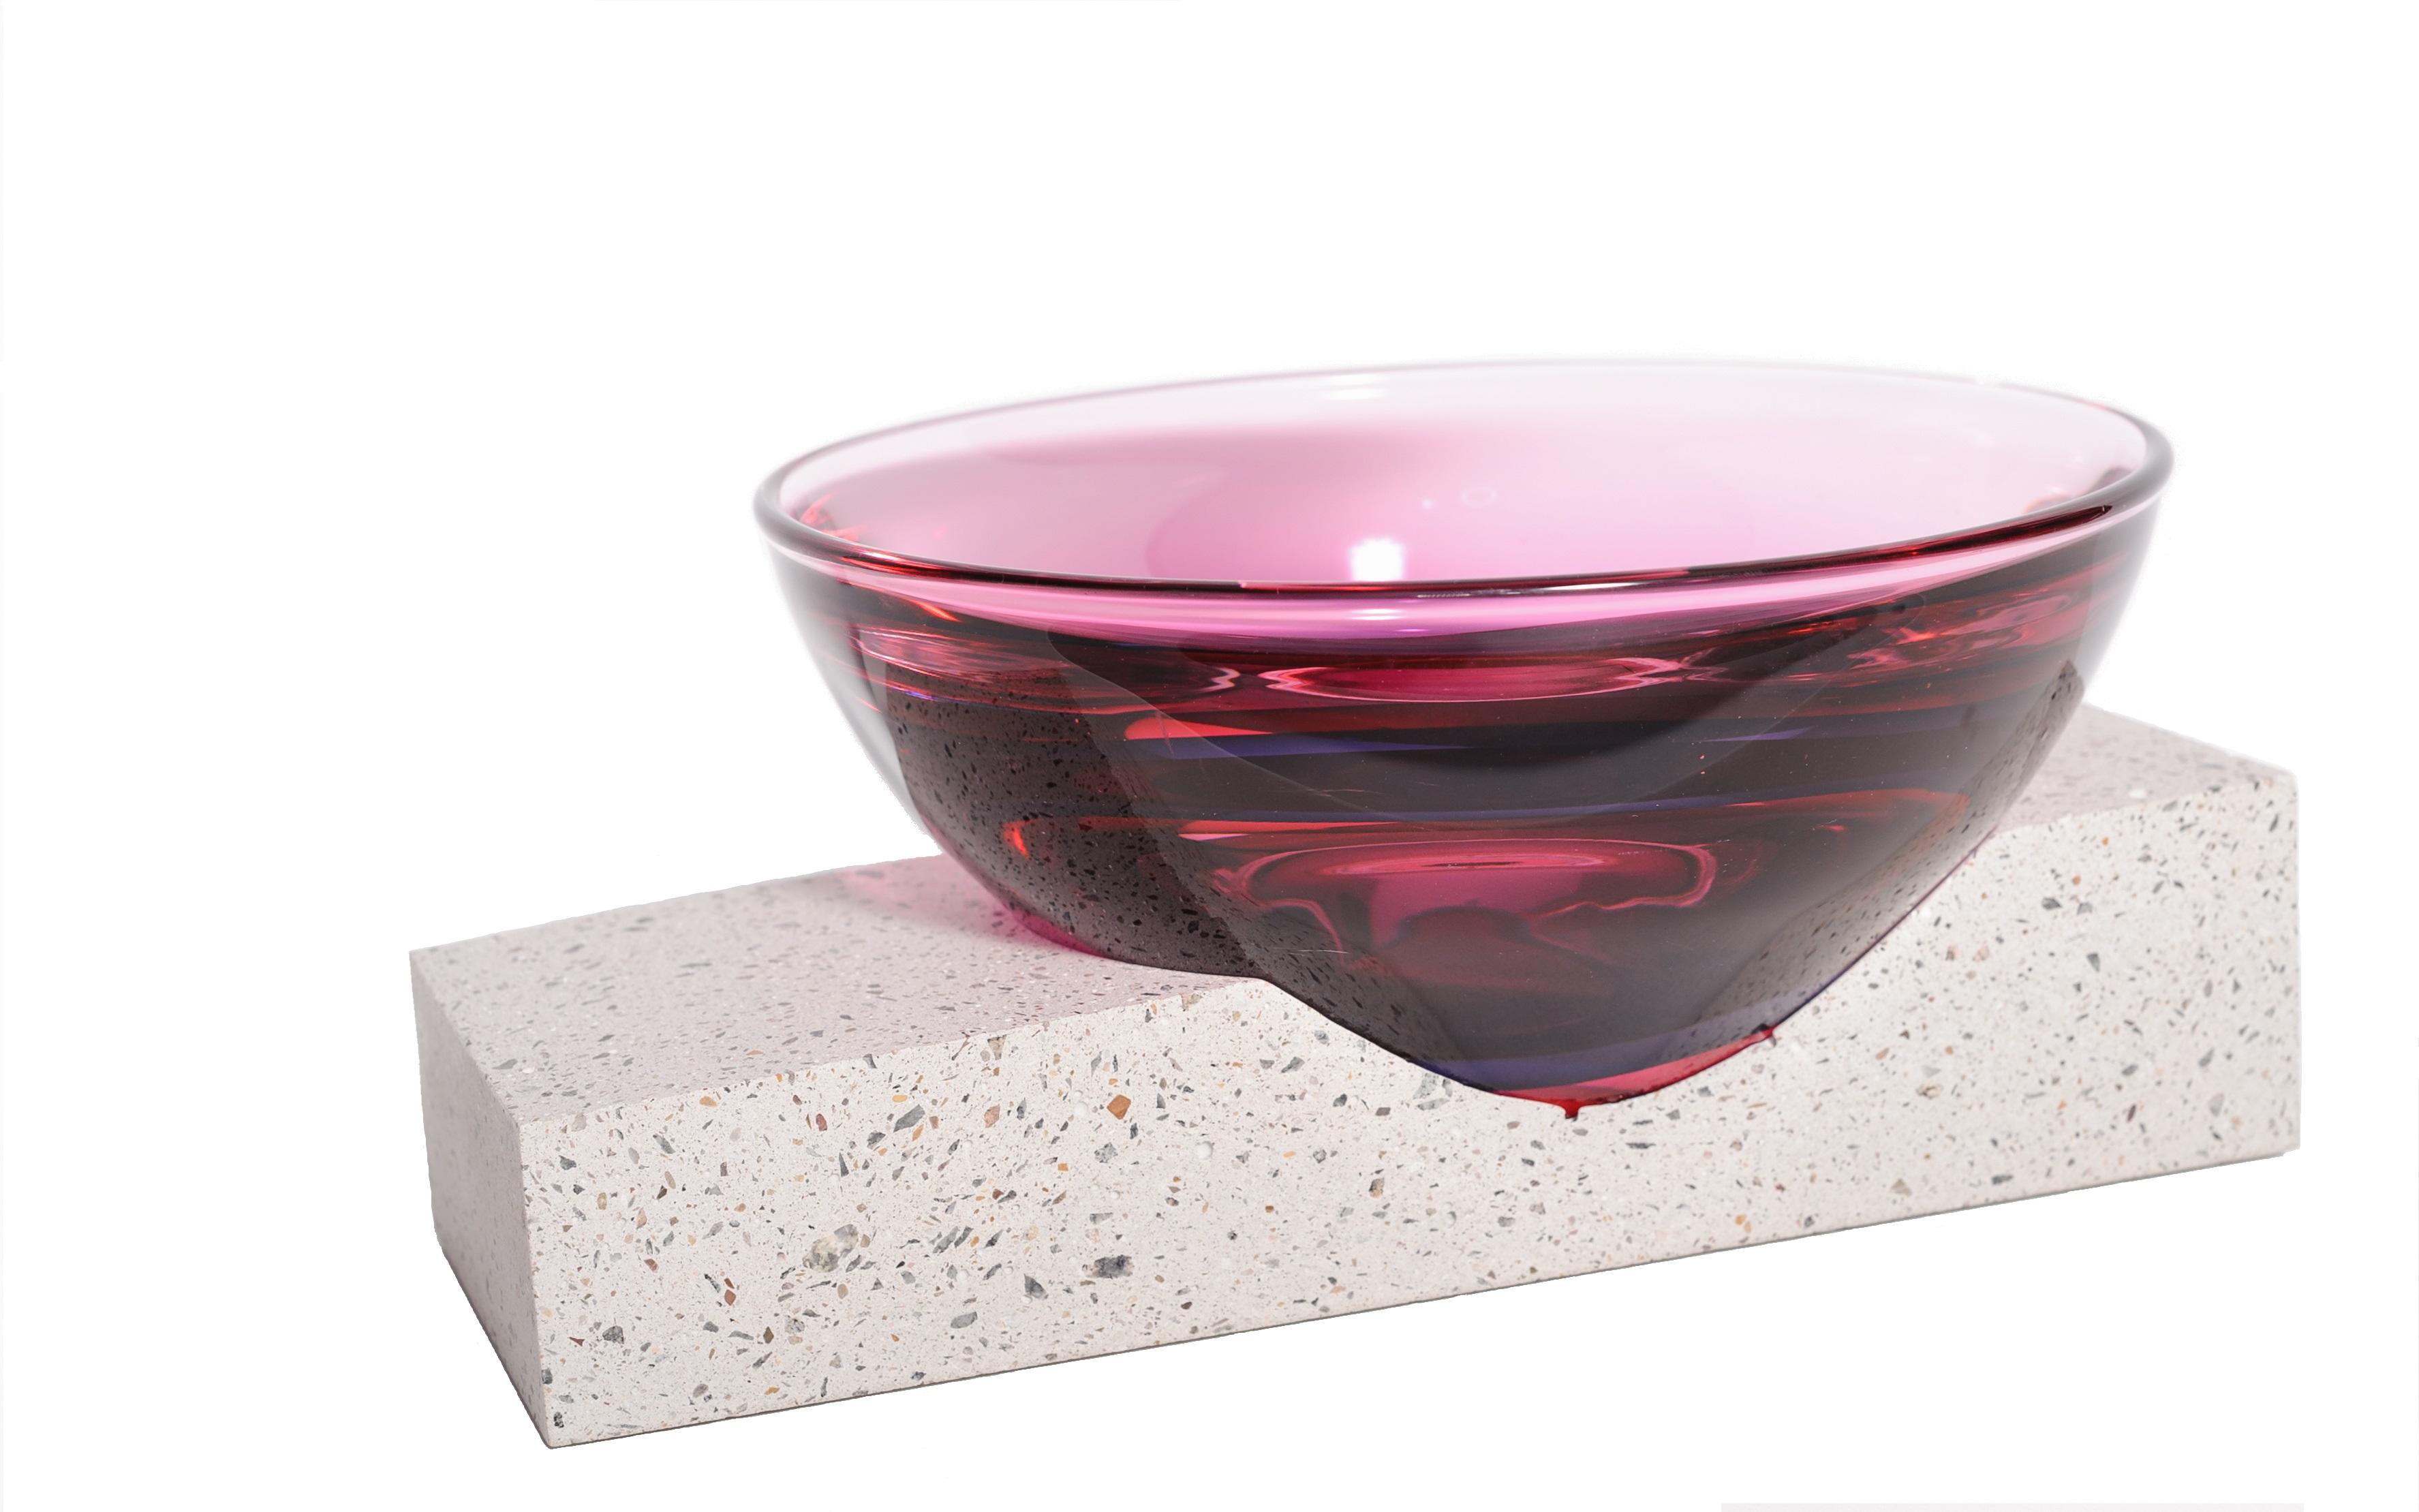 Robert Schrempp/Beton/Glas/Skulptur/Objekt